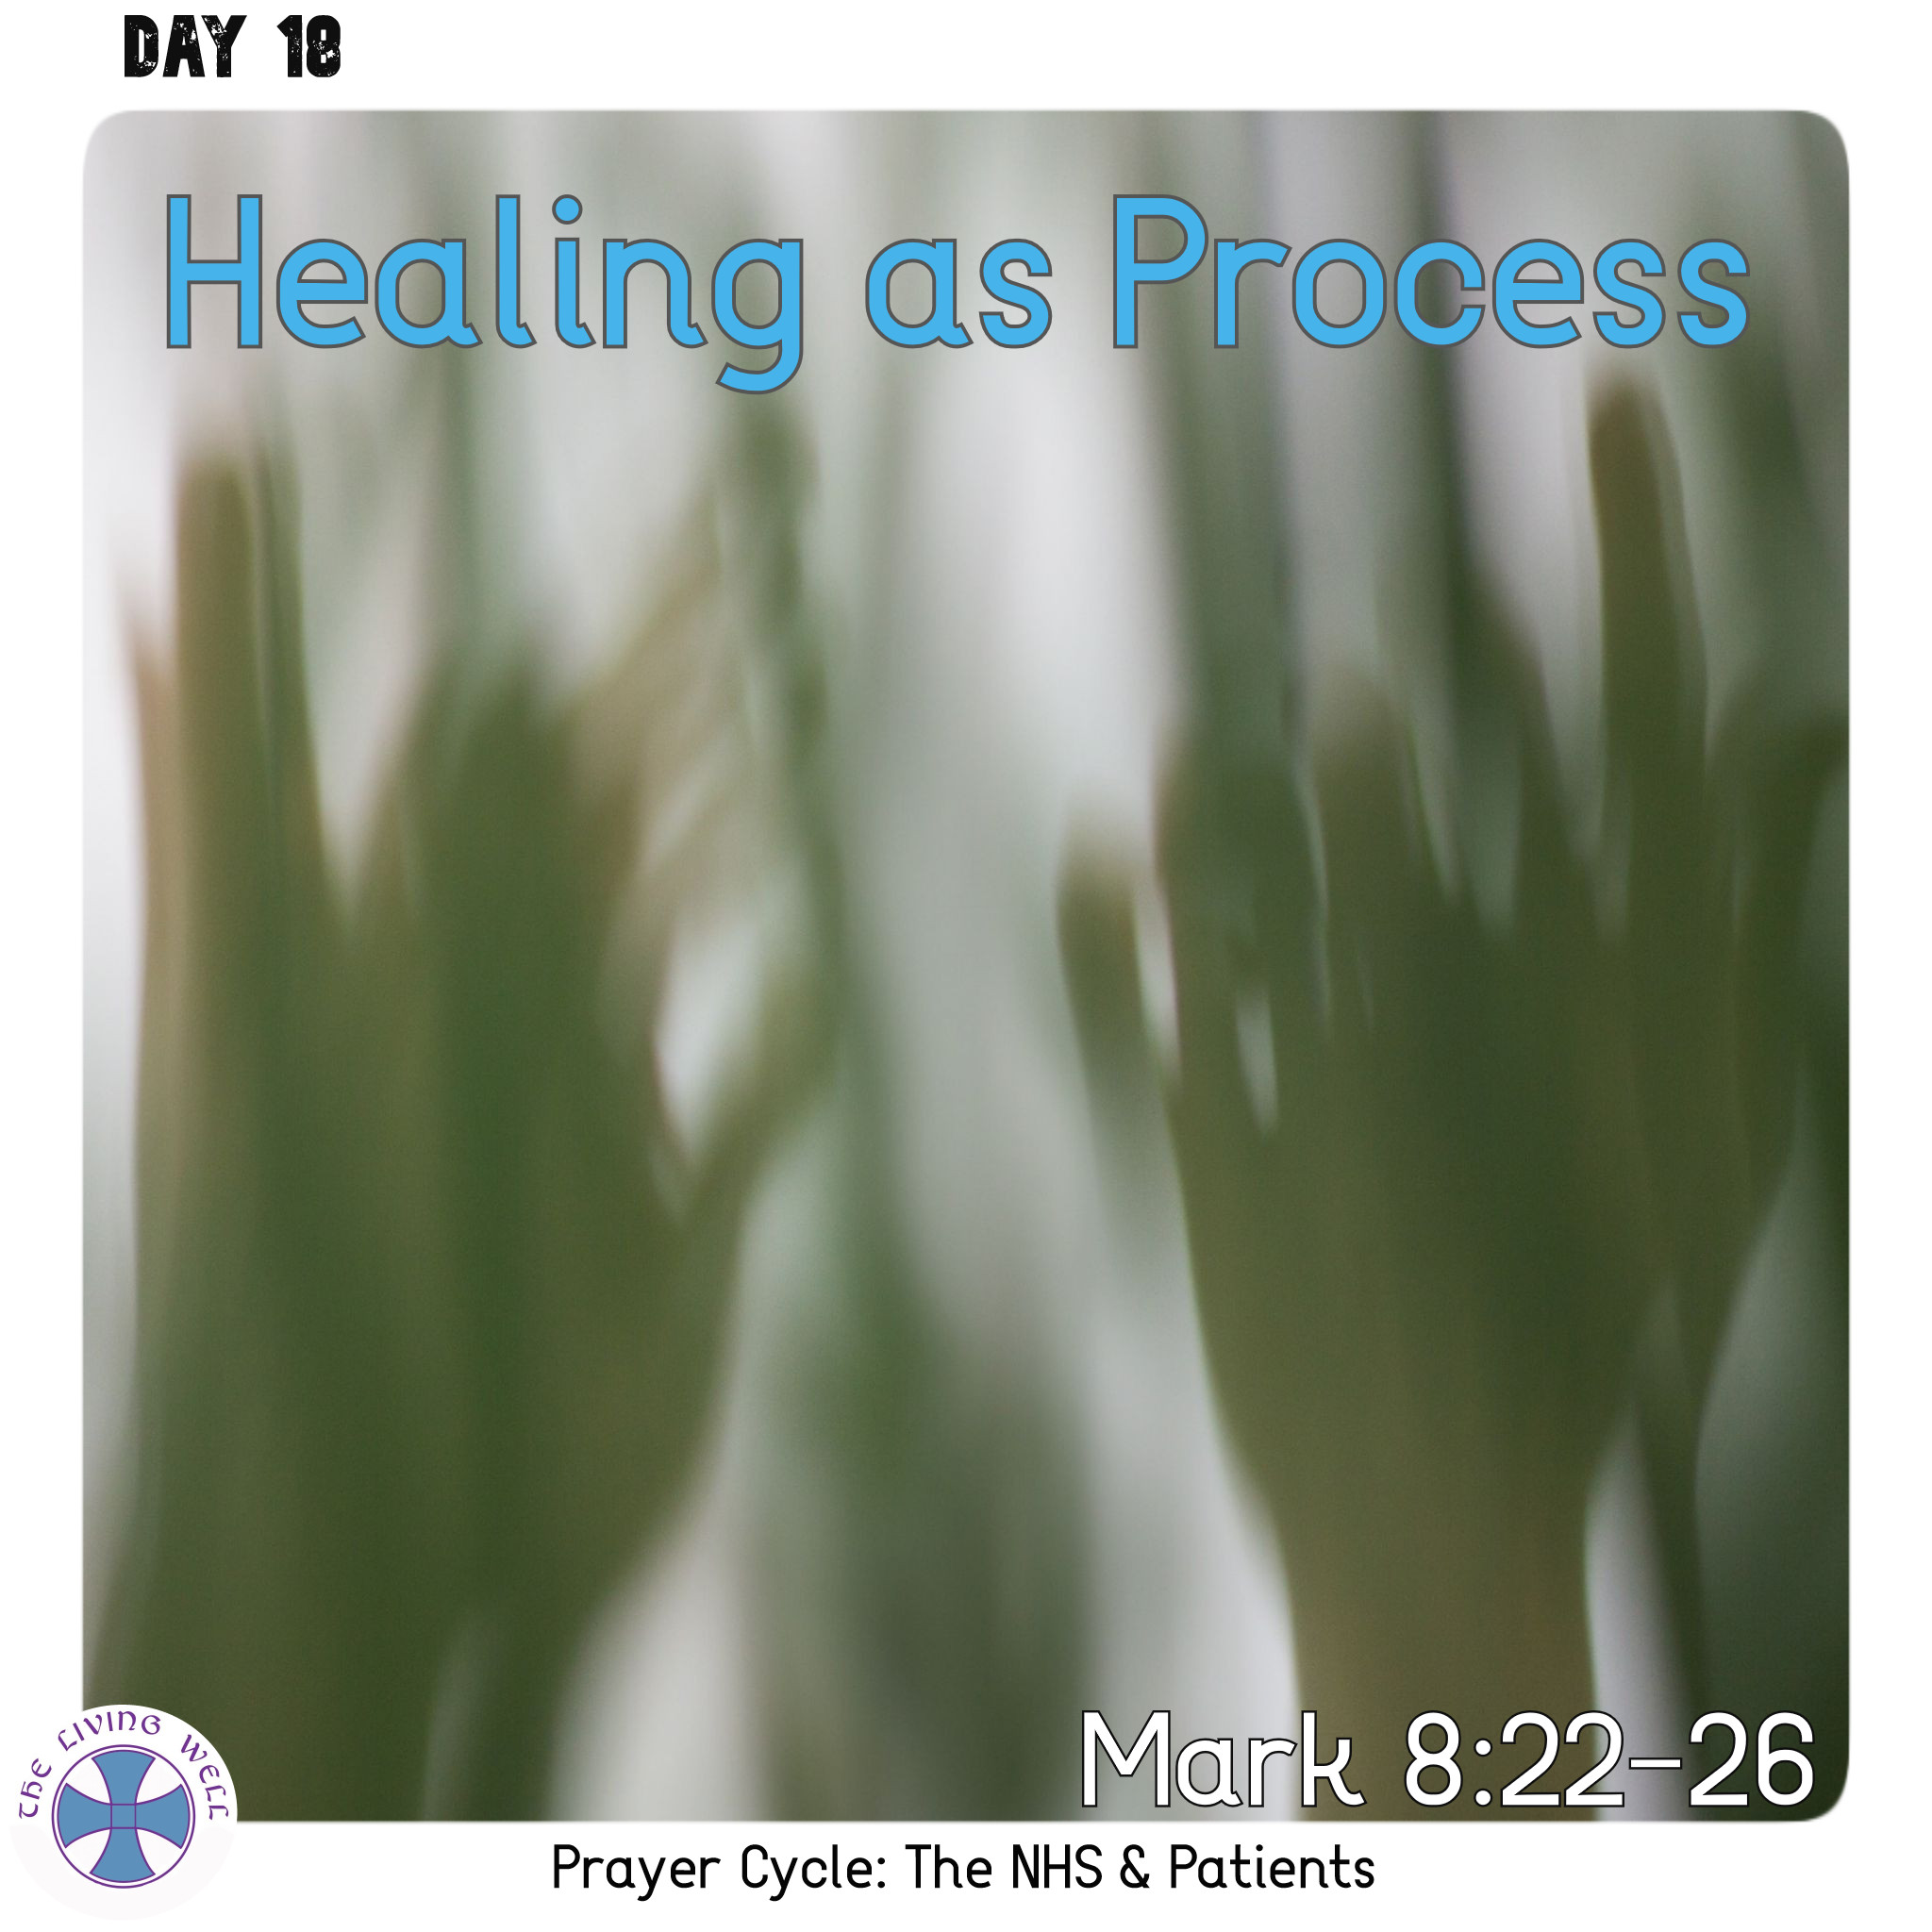 Healing as Process